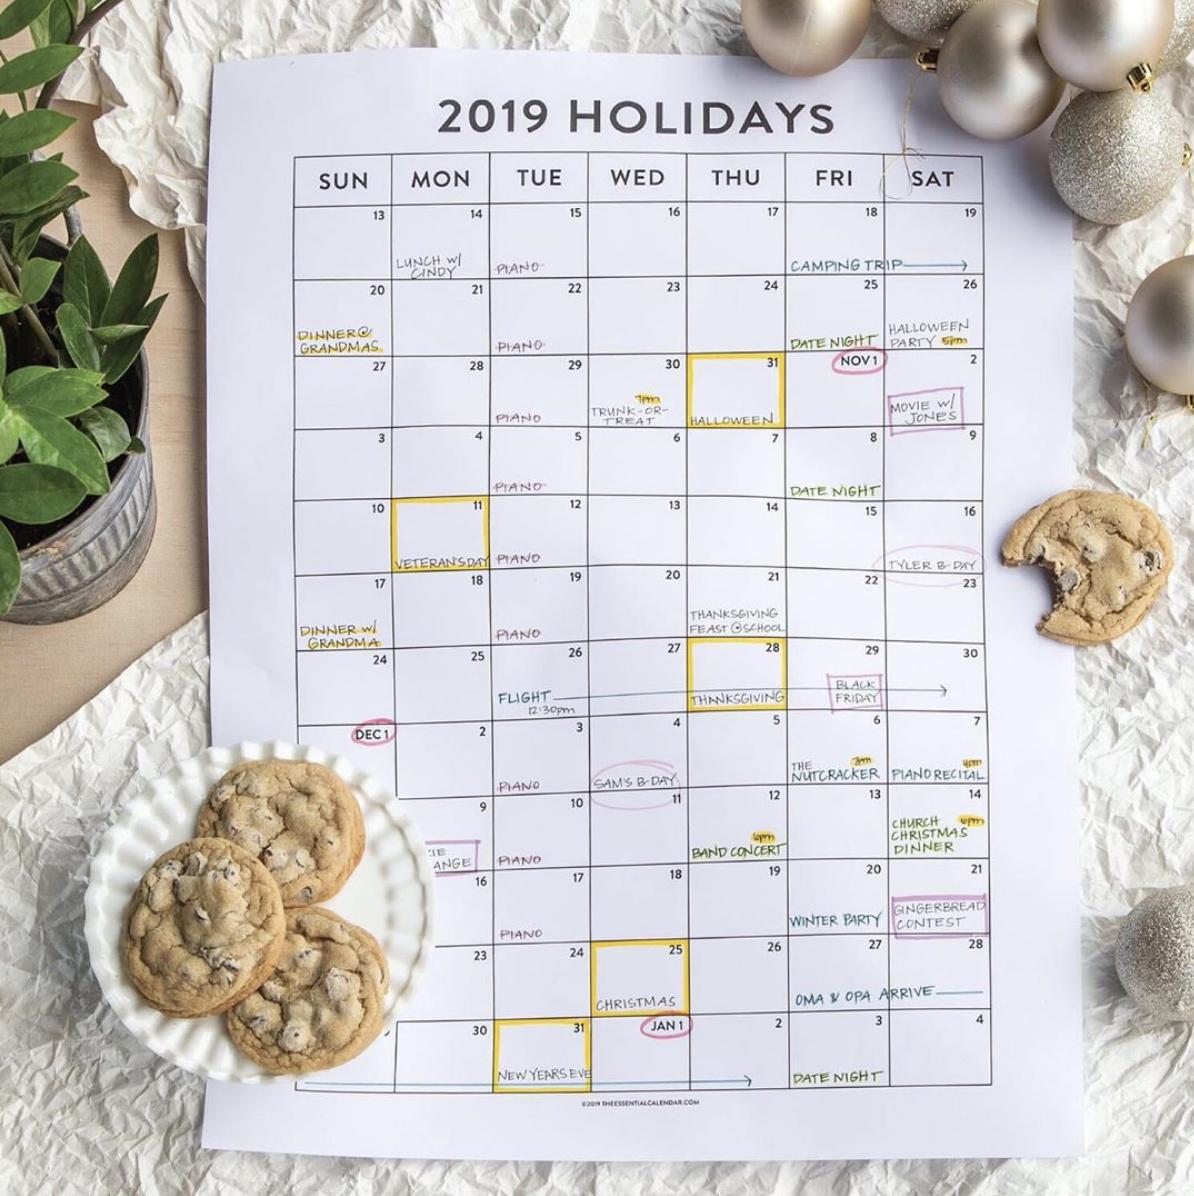 the holiday calendar from The Essential Calendar